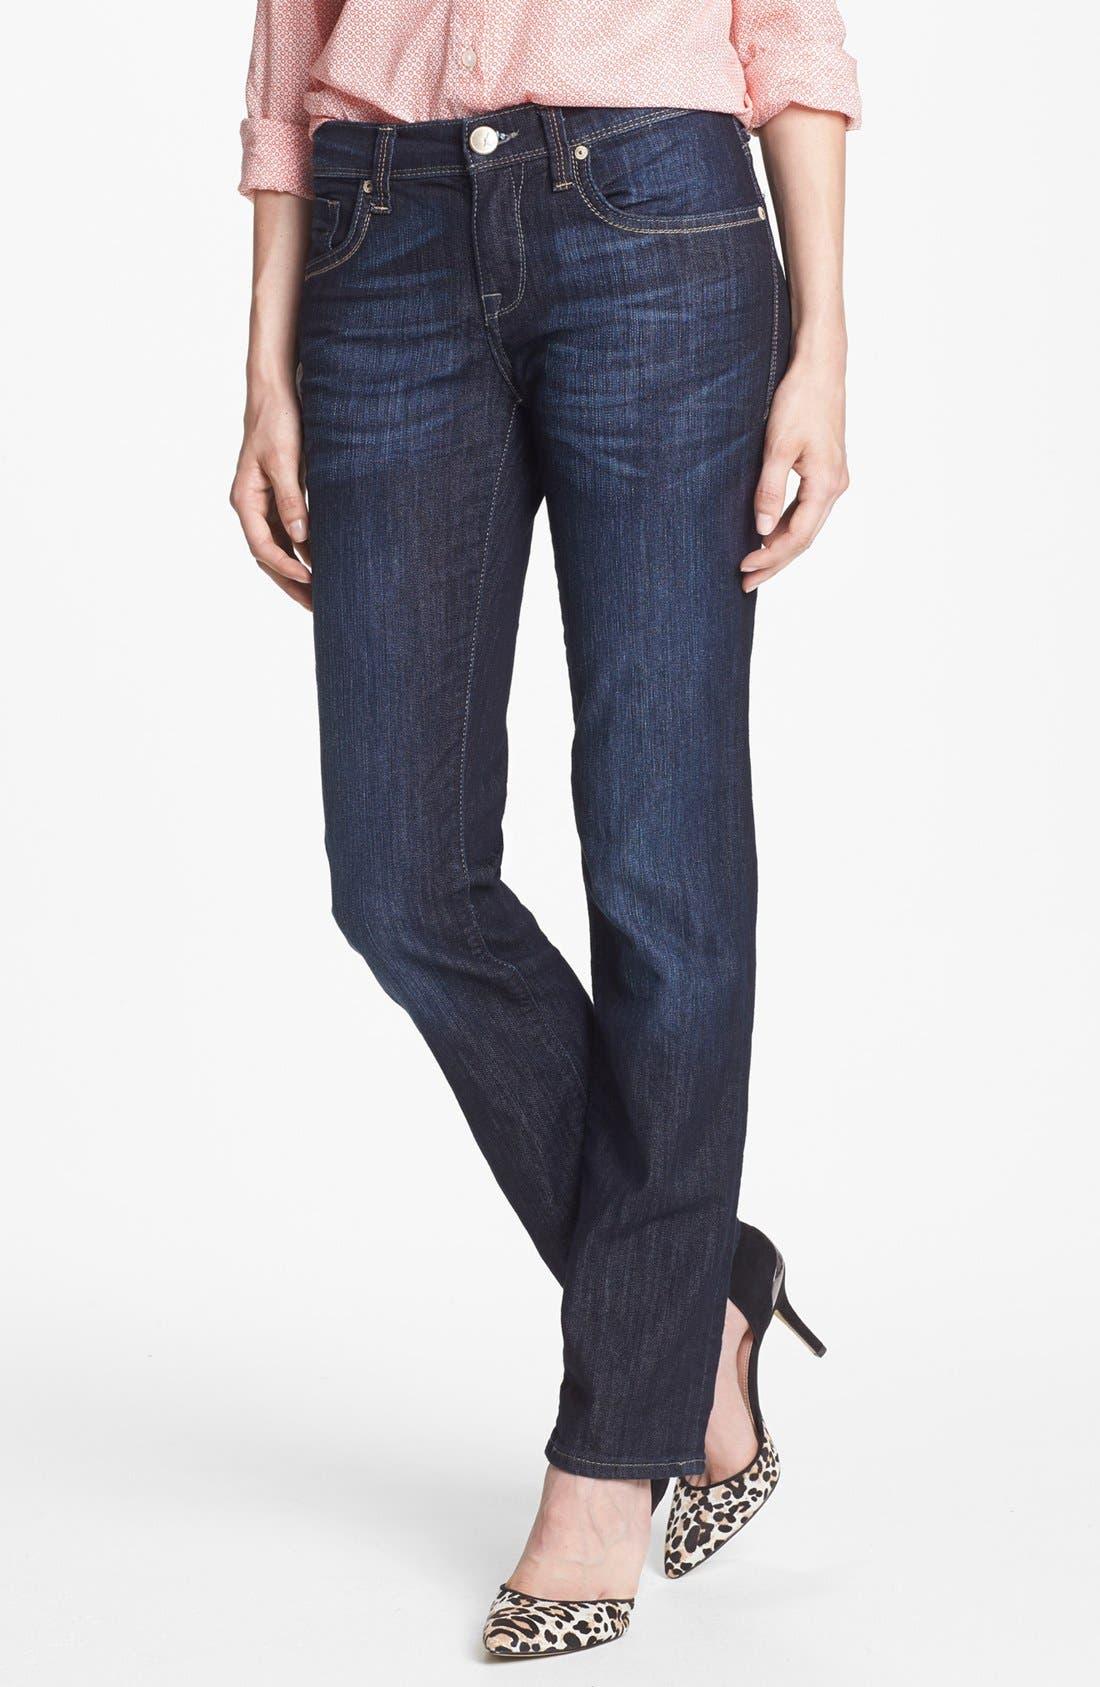 Alternate Image 1 Selected - Mavi Jeans 'Molly' Straight Leg Jeans (St. Tropez)